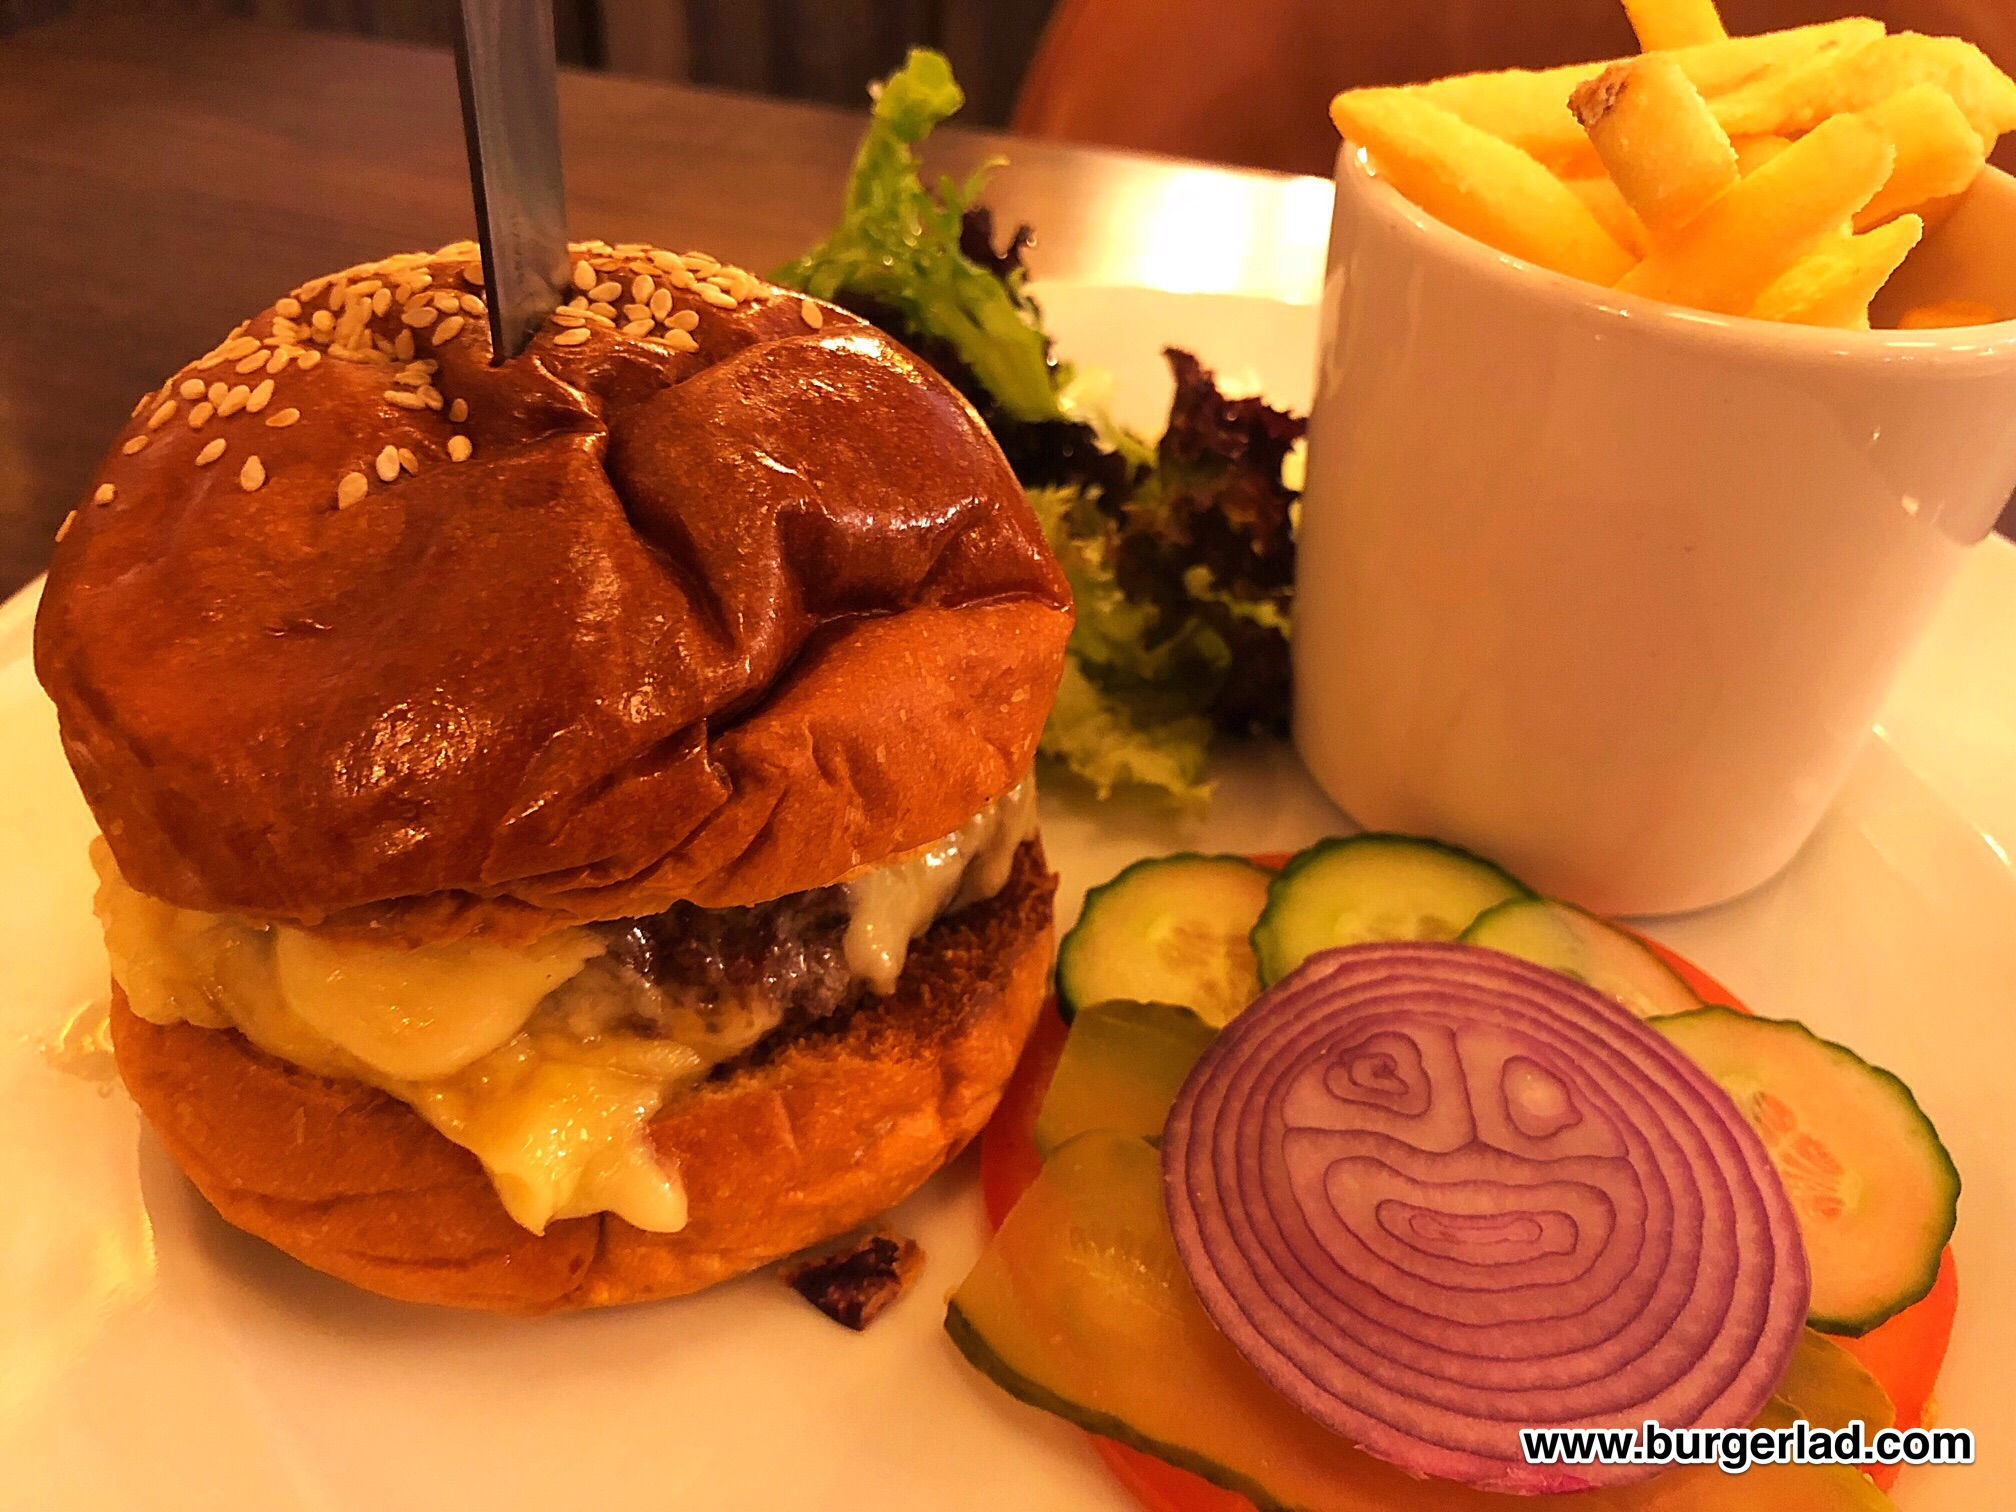 Randall & Aubin Prime Beef Burger